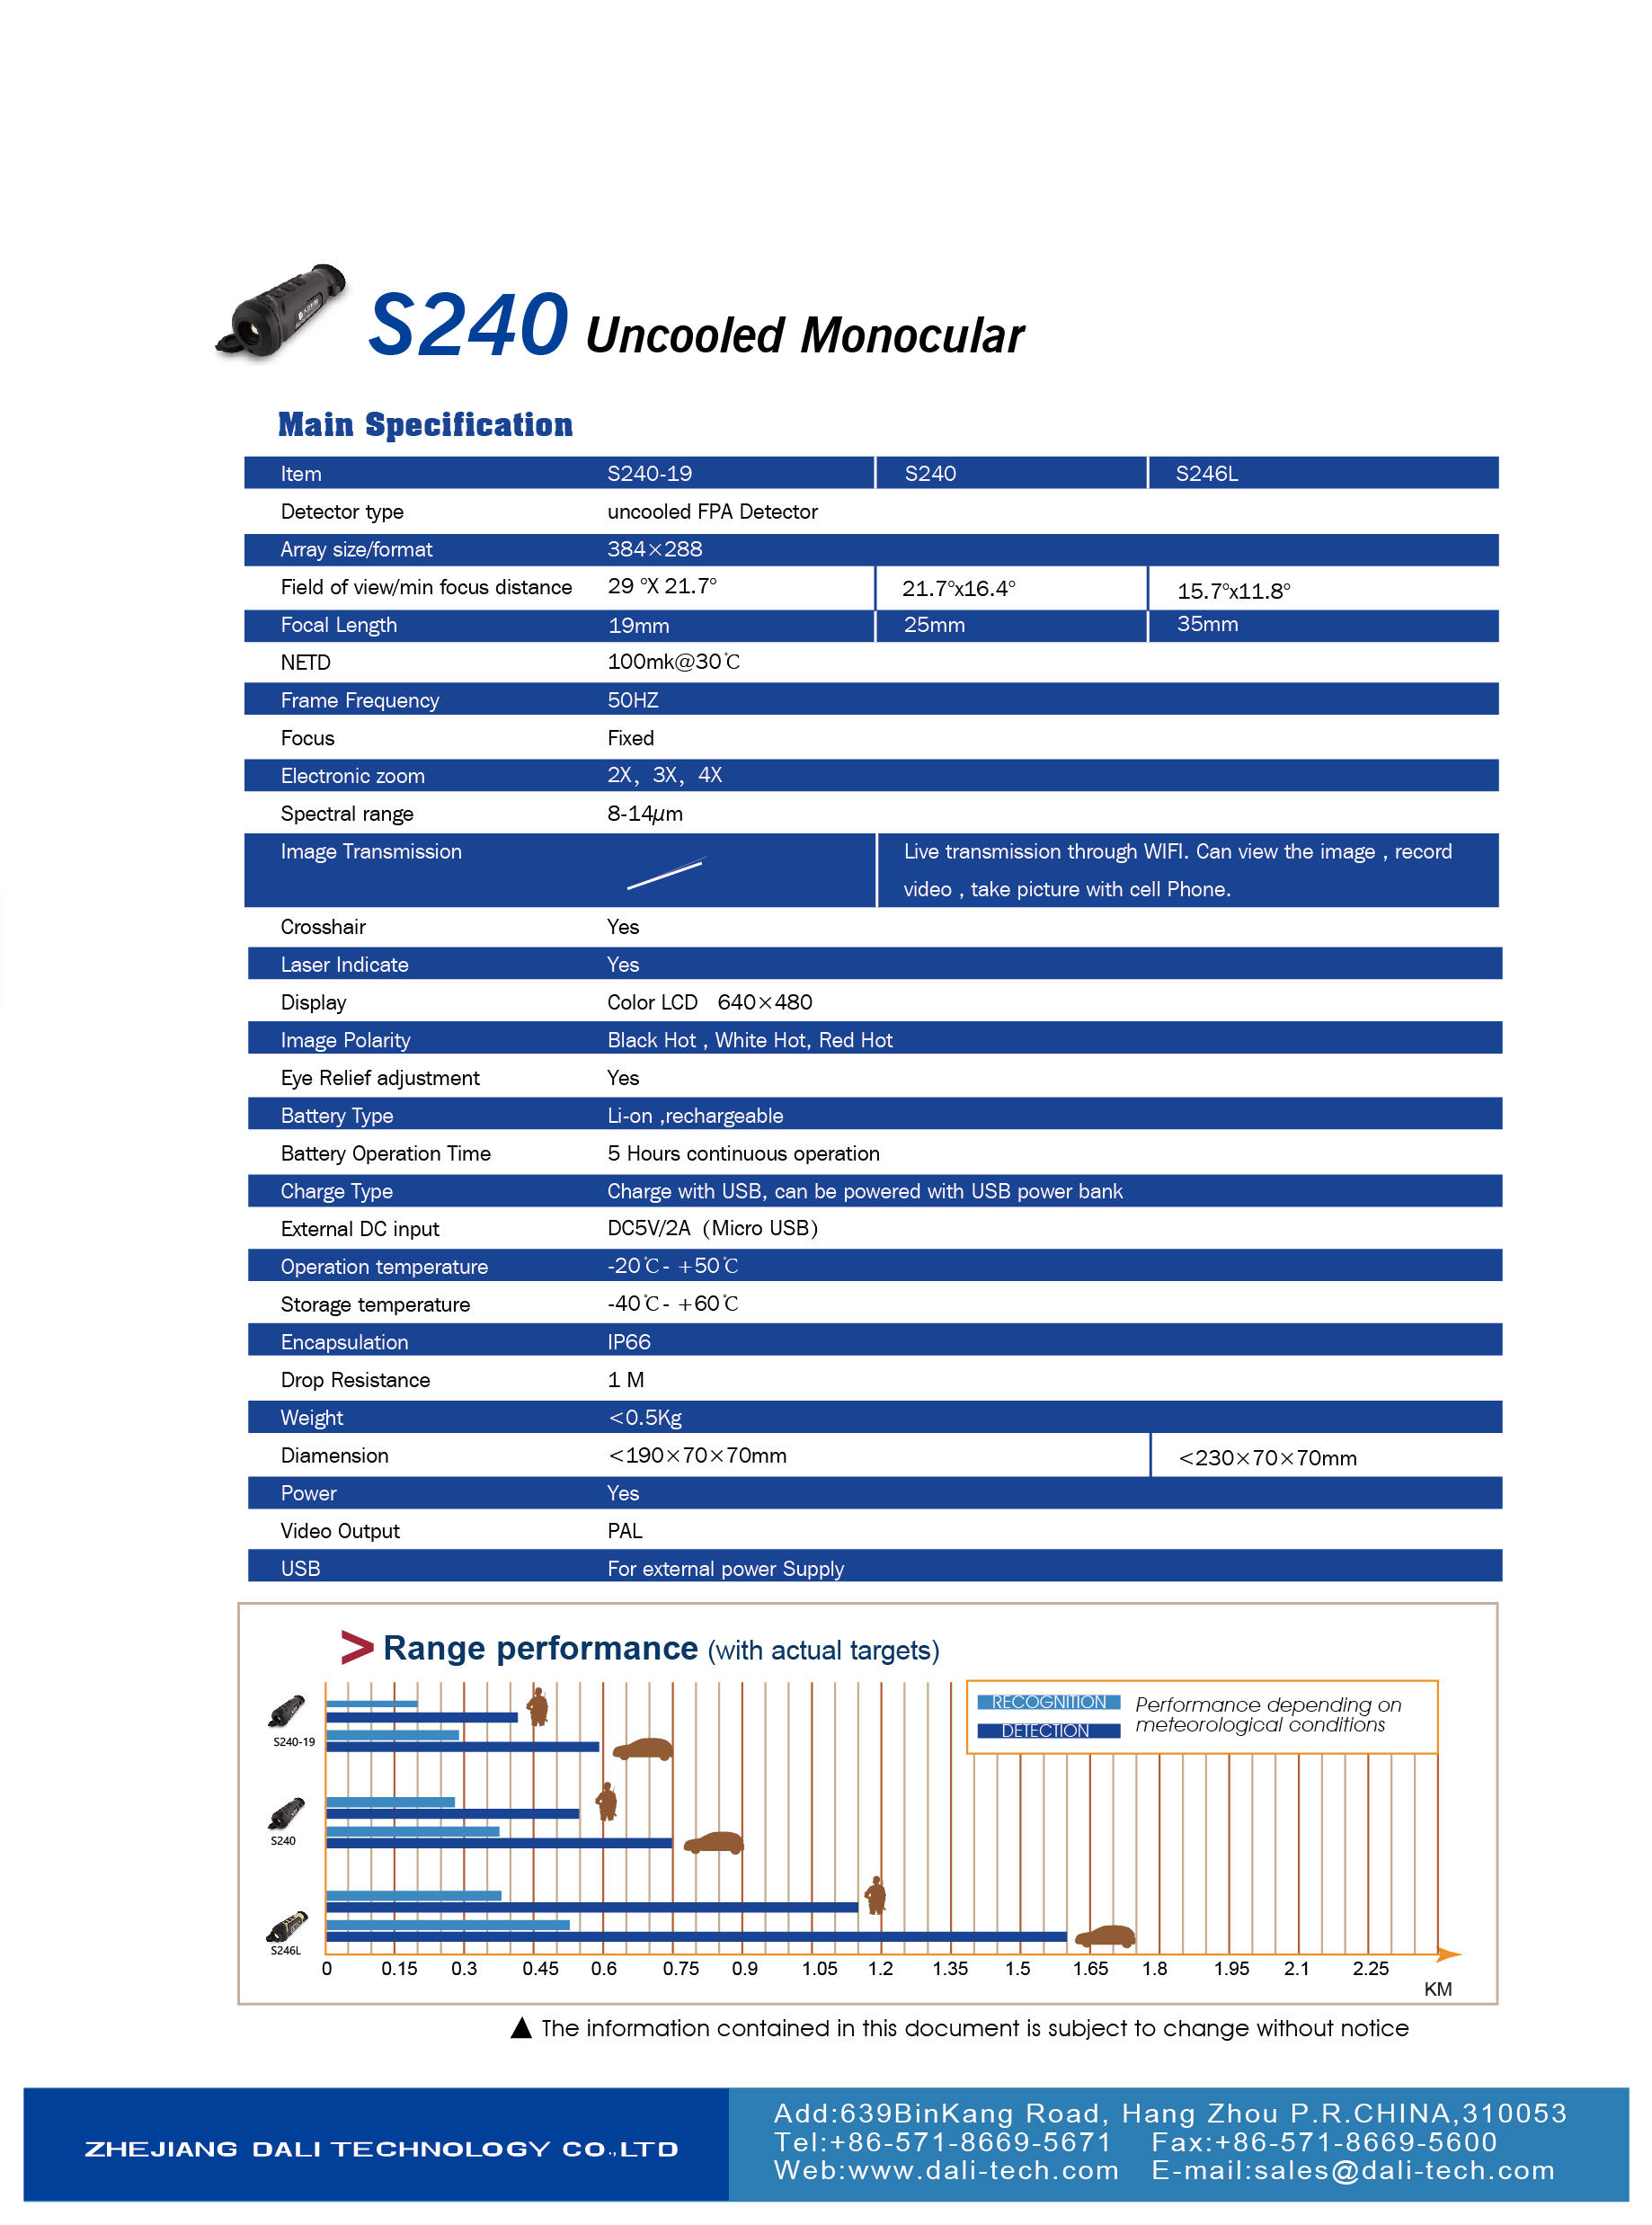 S246L-35mm Dali-Tech Thermal UK Monoculars